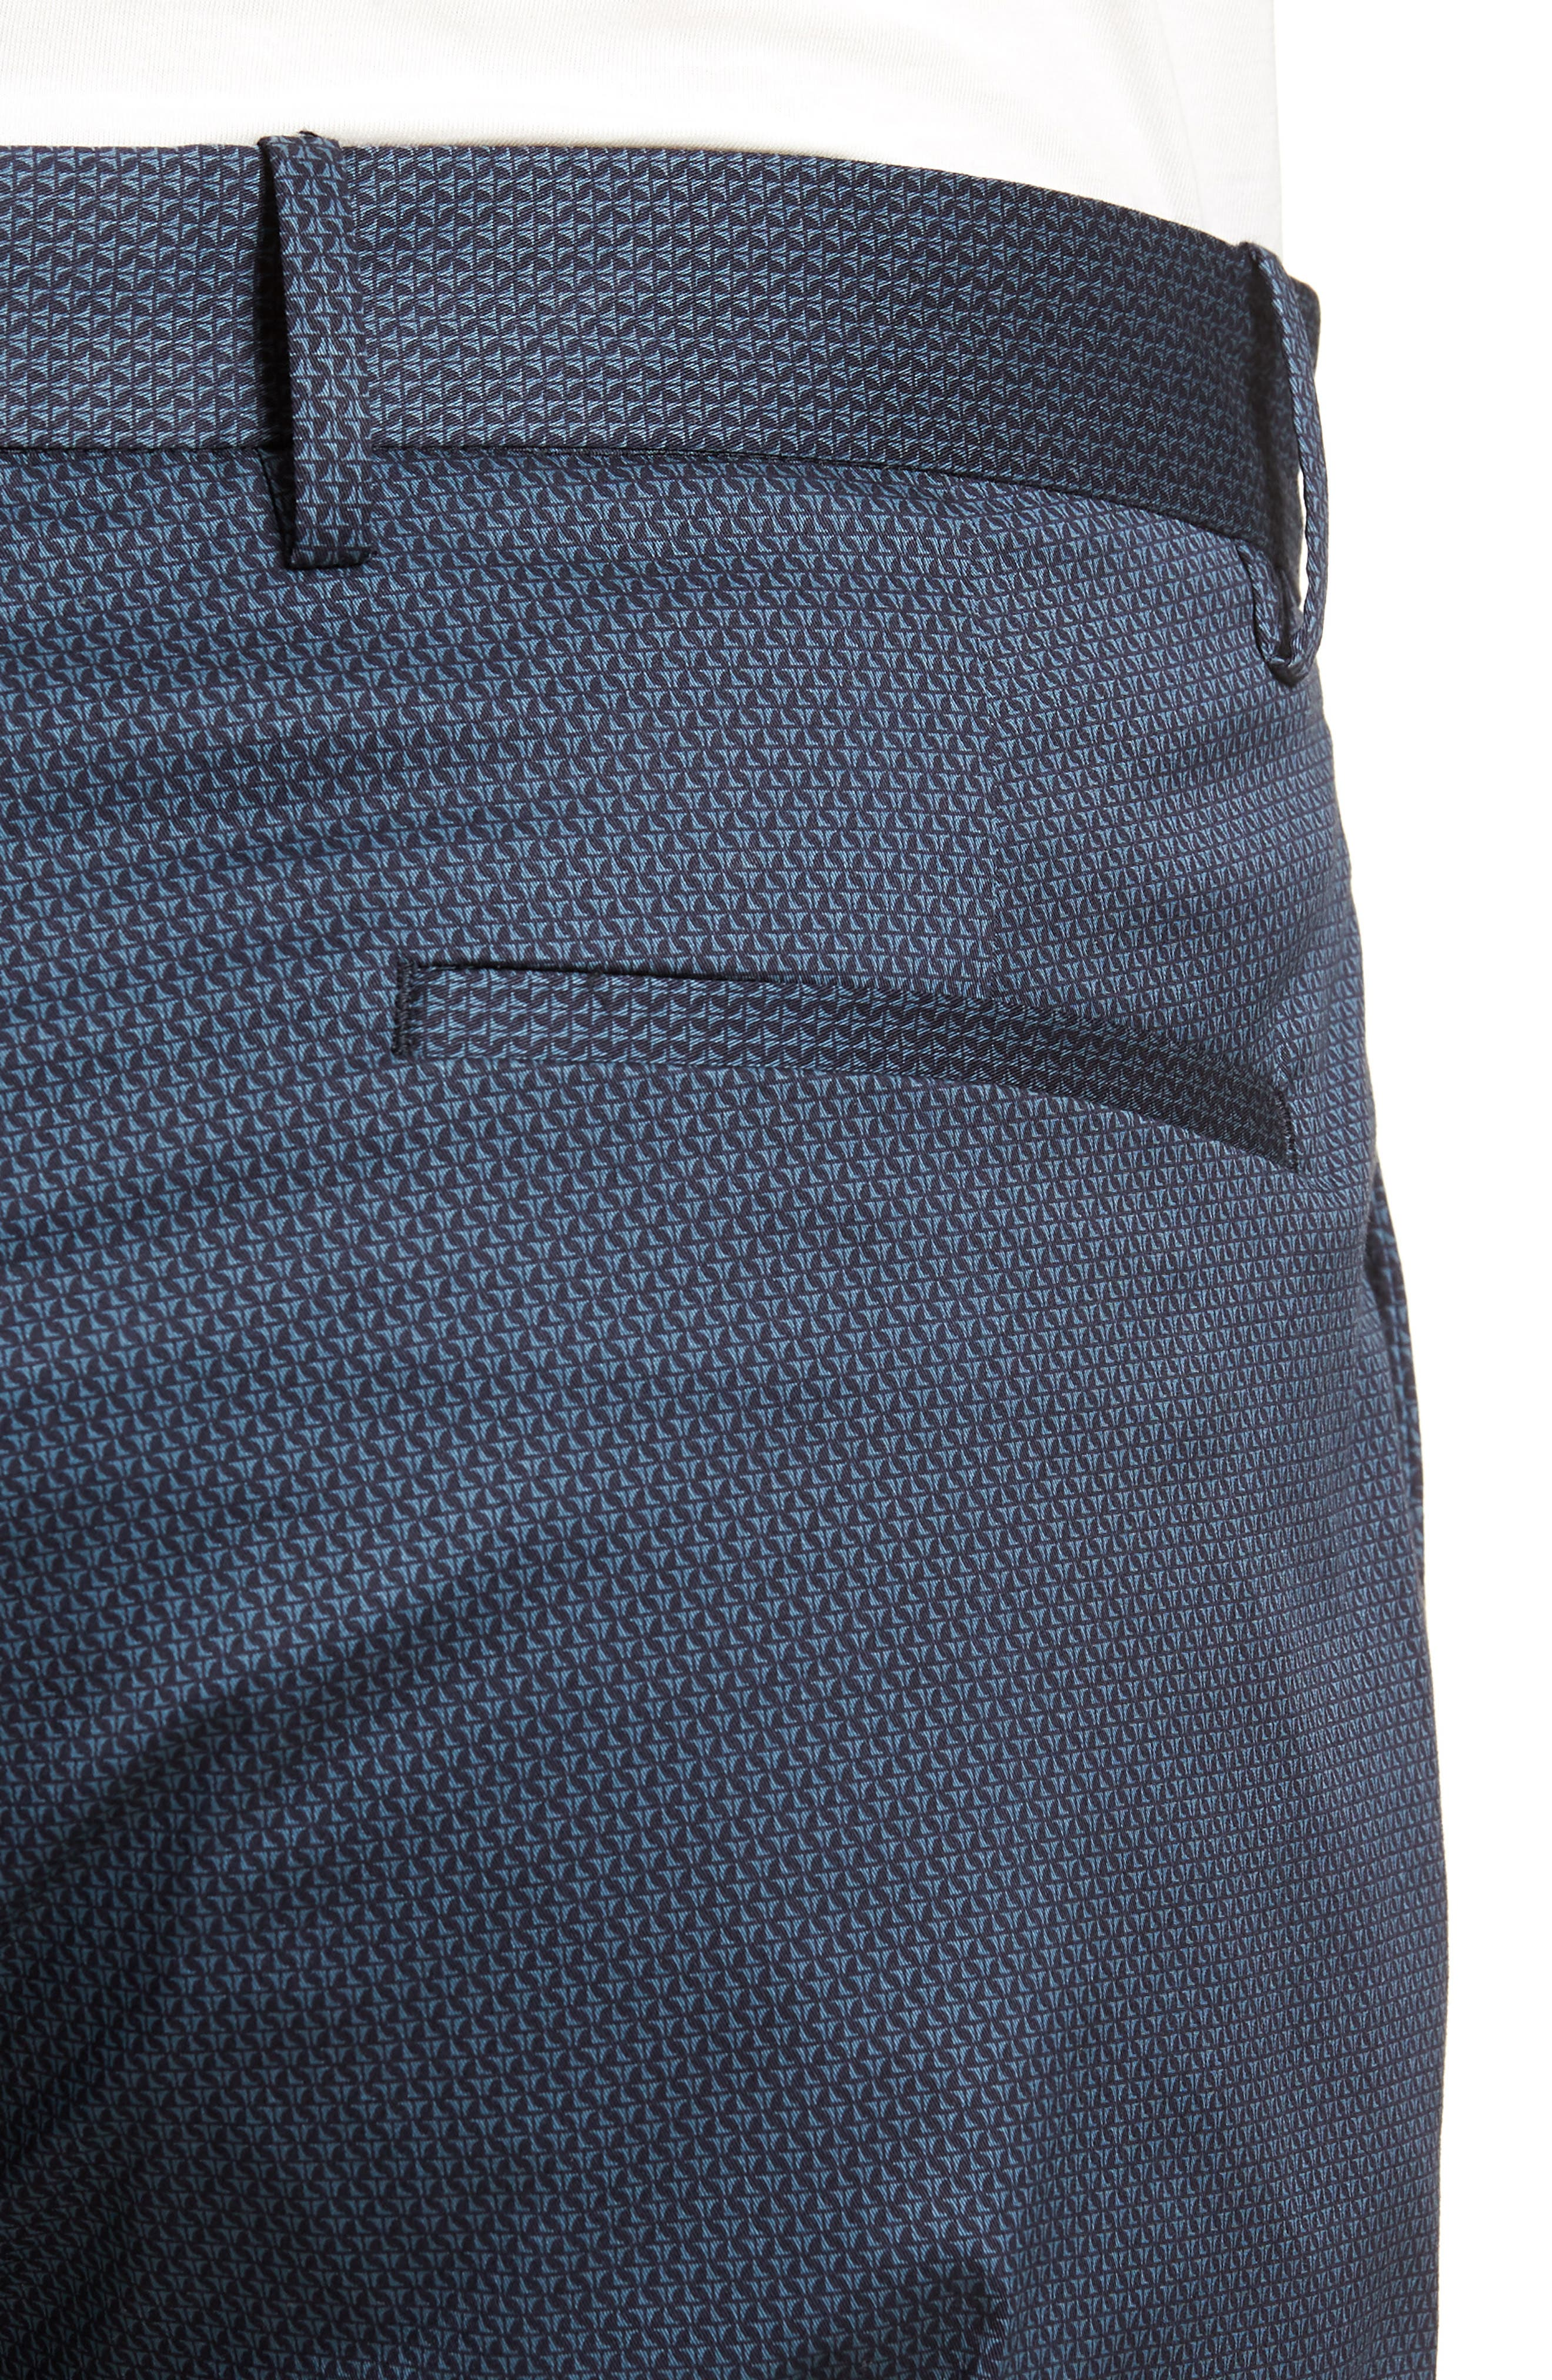 Zaine Stretch Cotton Shorts,                             Alternate thumbnail 4, color,                             ECLIPSE MULTI